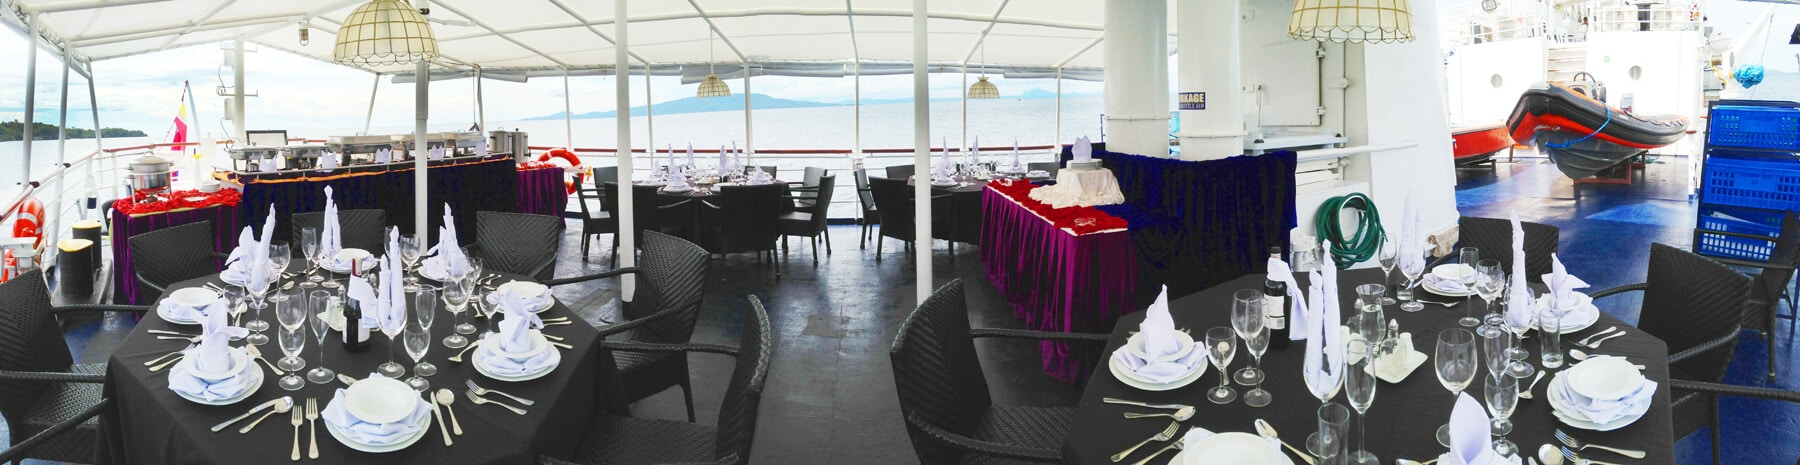 Dining Deck Panorama medium